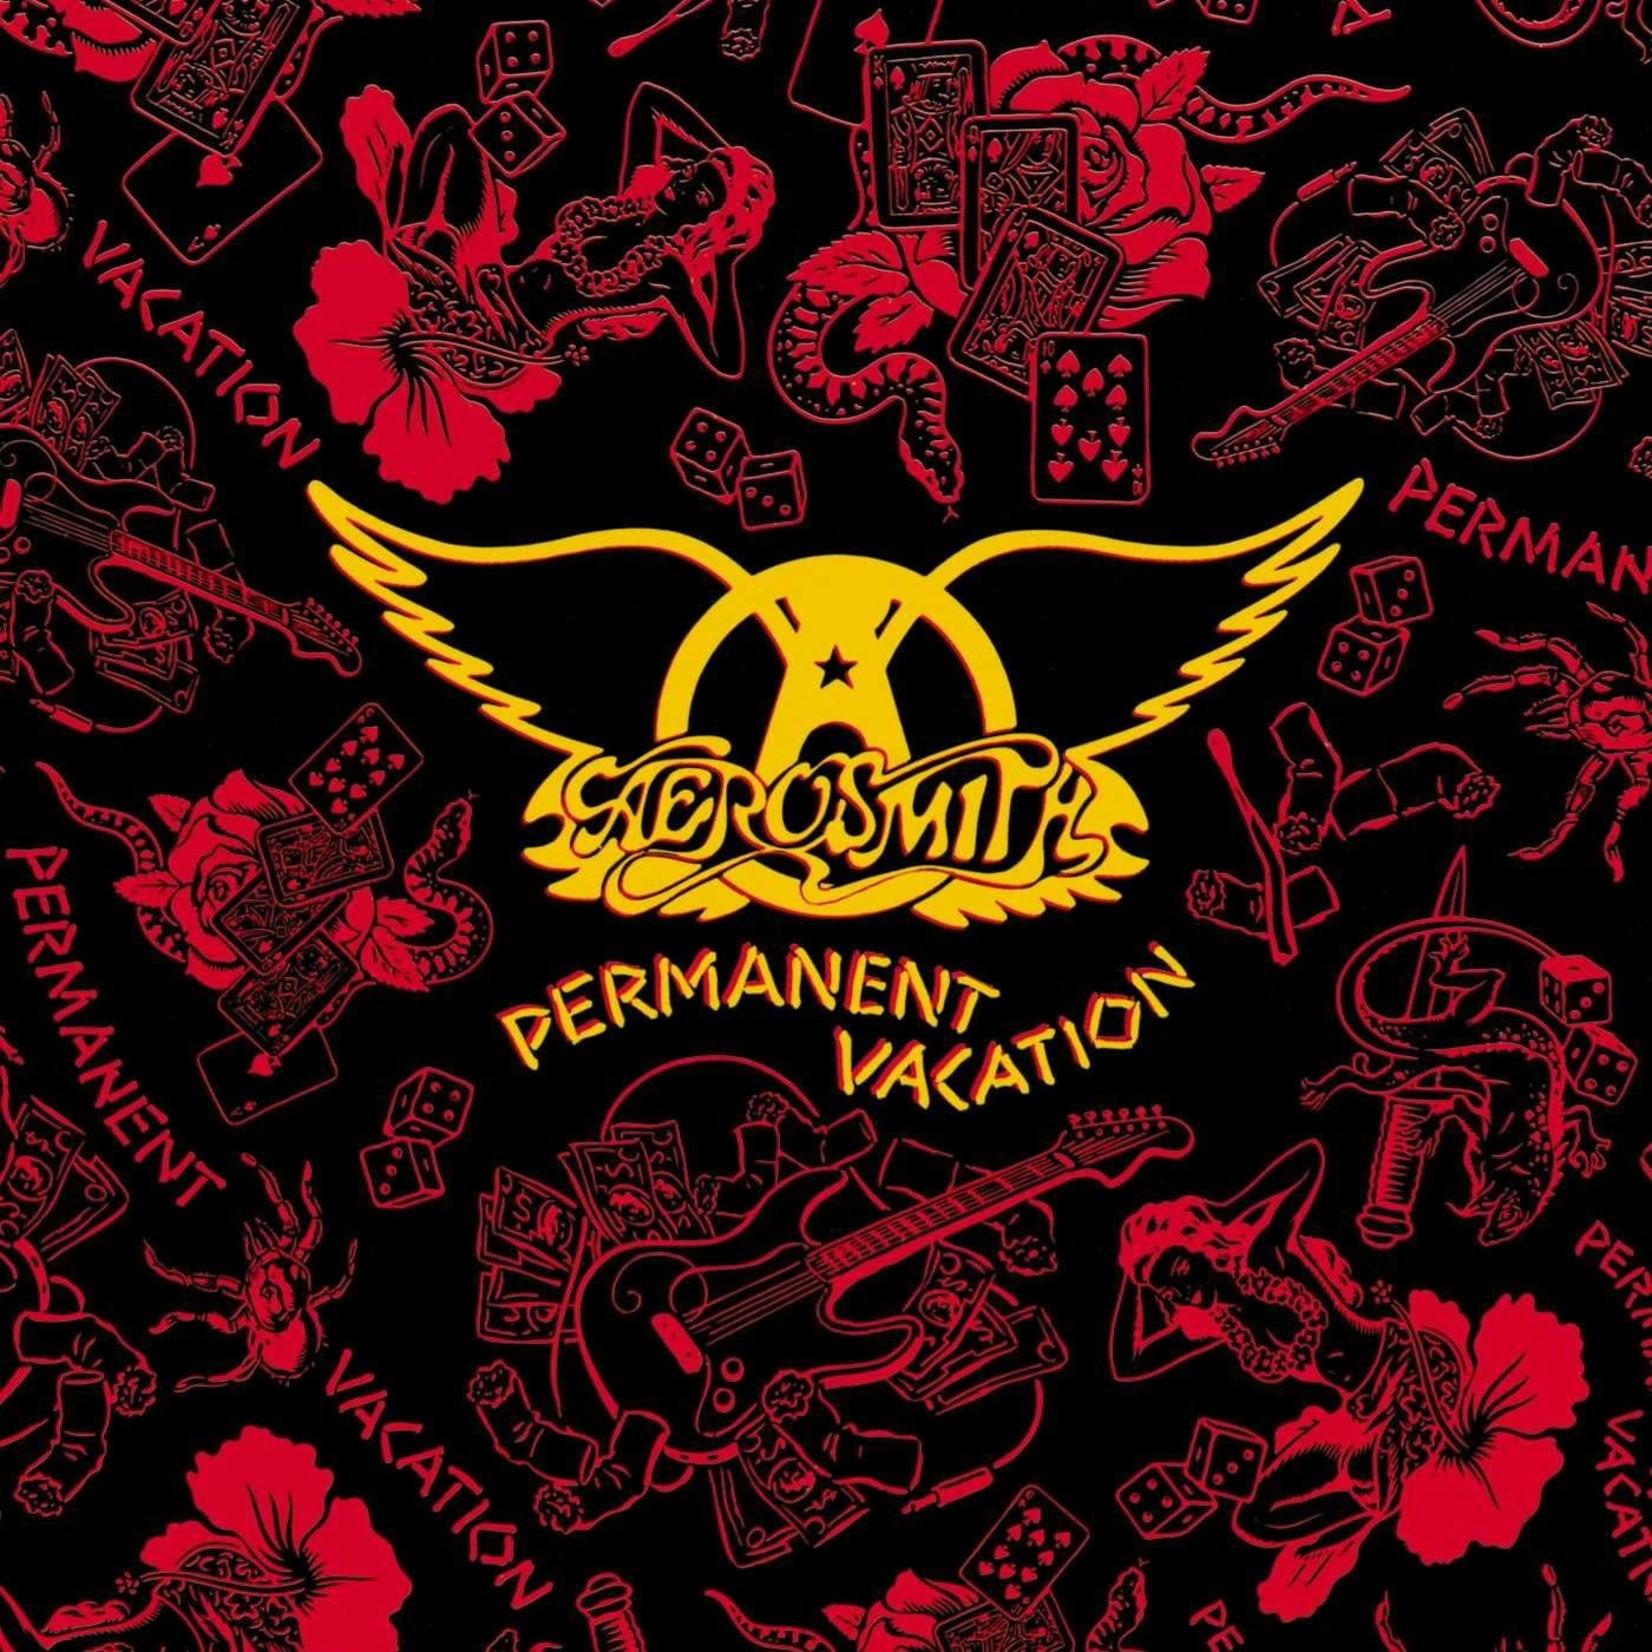 [Vintage] Aerosmith: Permanent Vacation